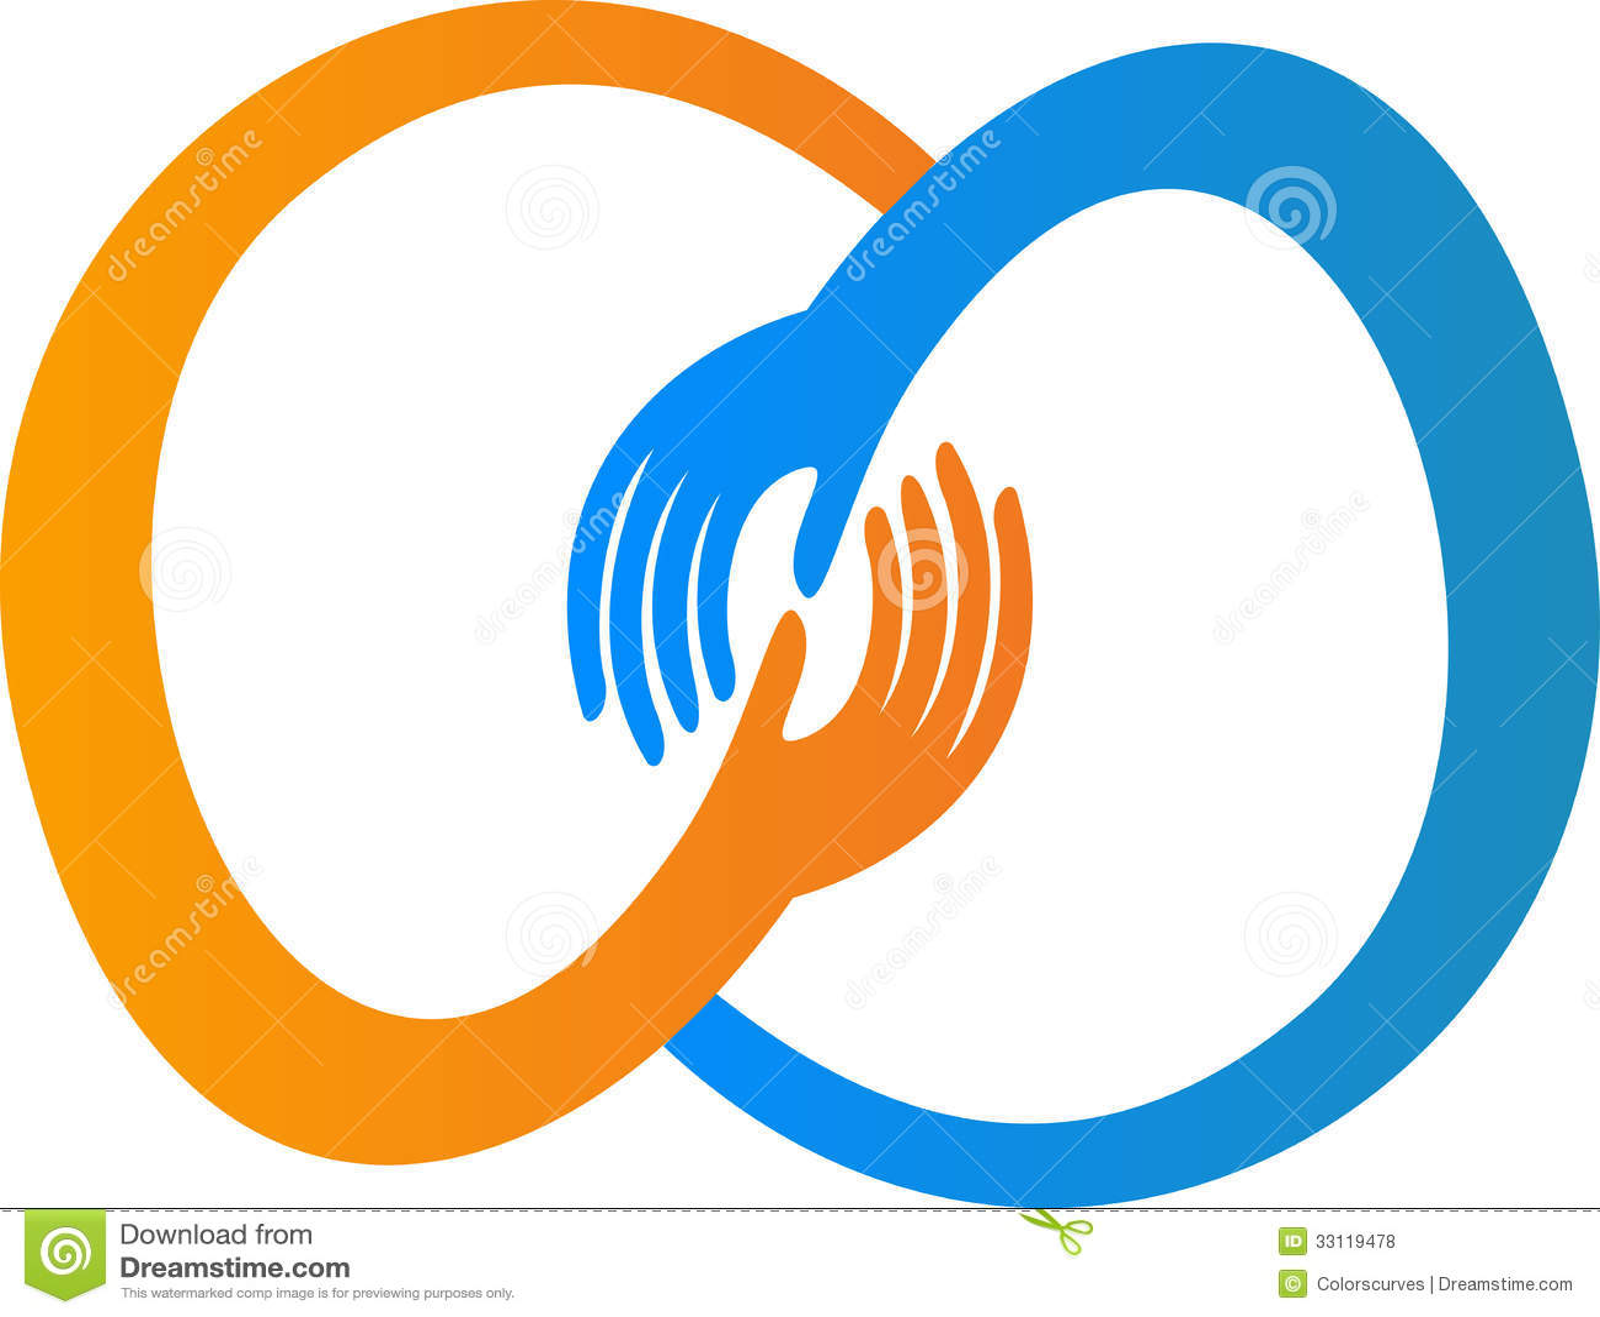 Logo della mano